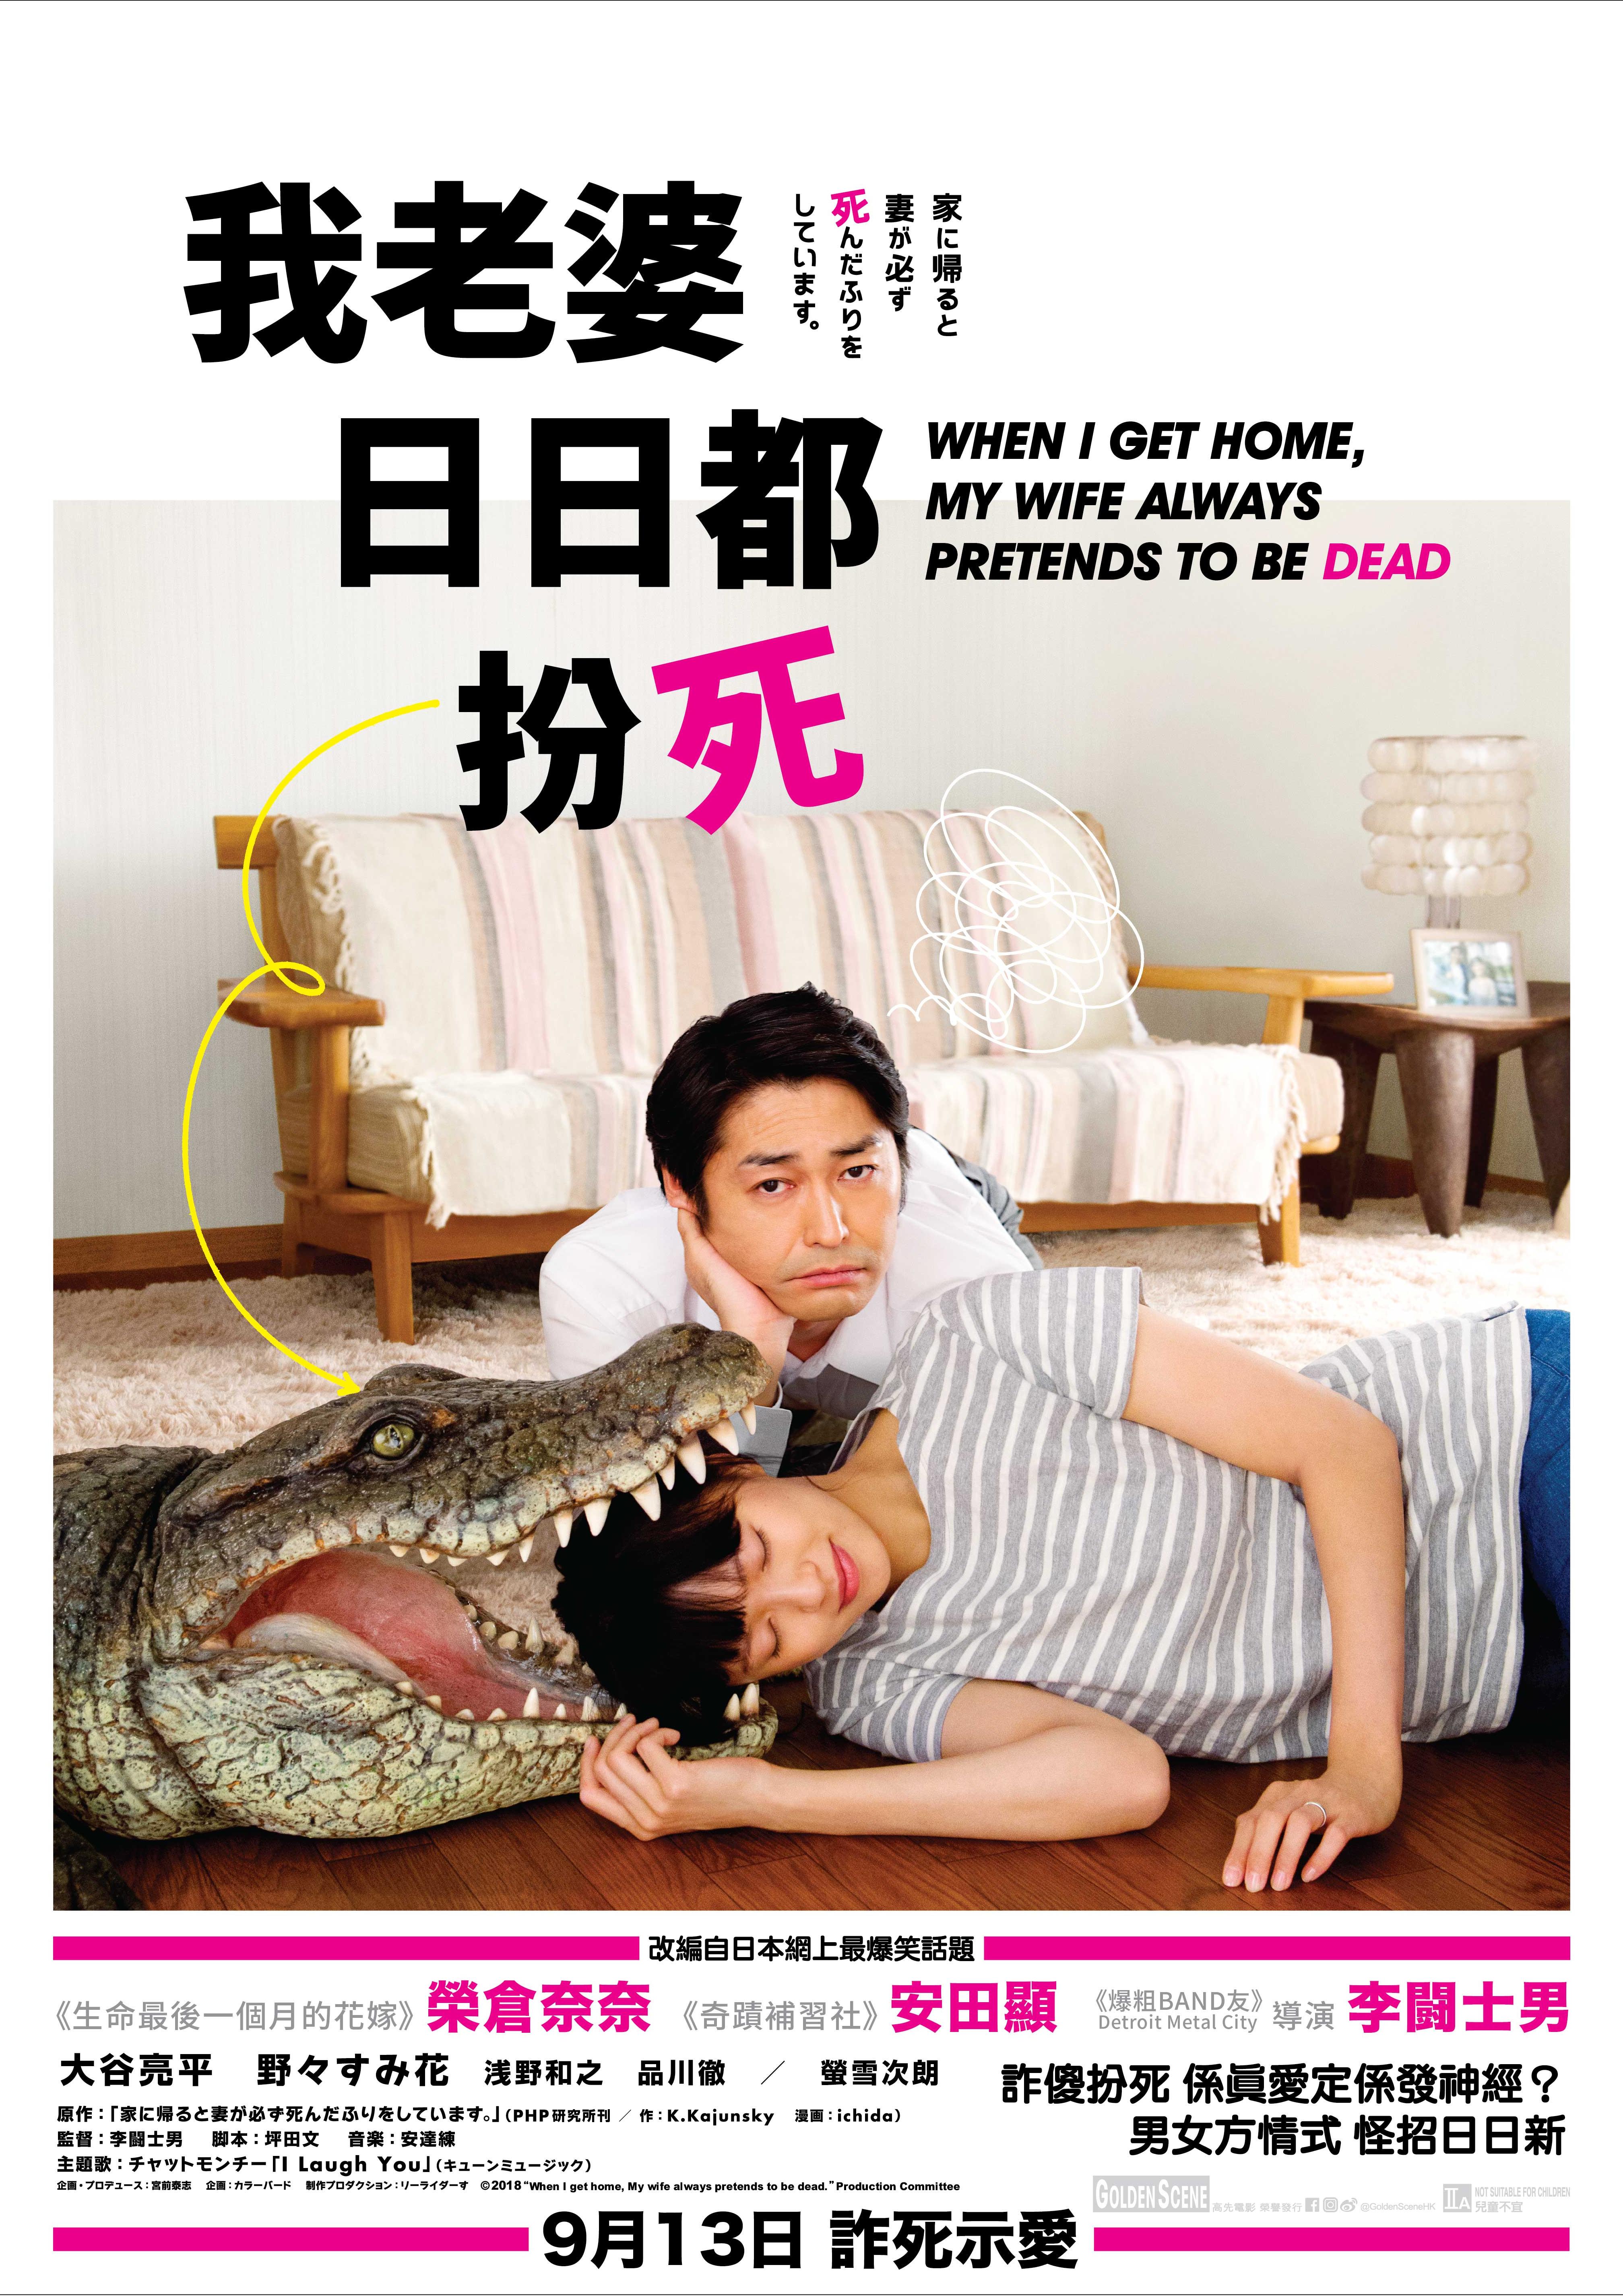 0731 Final poster